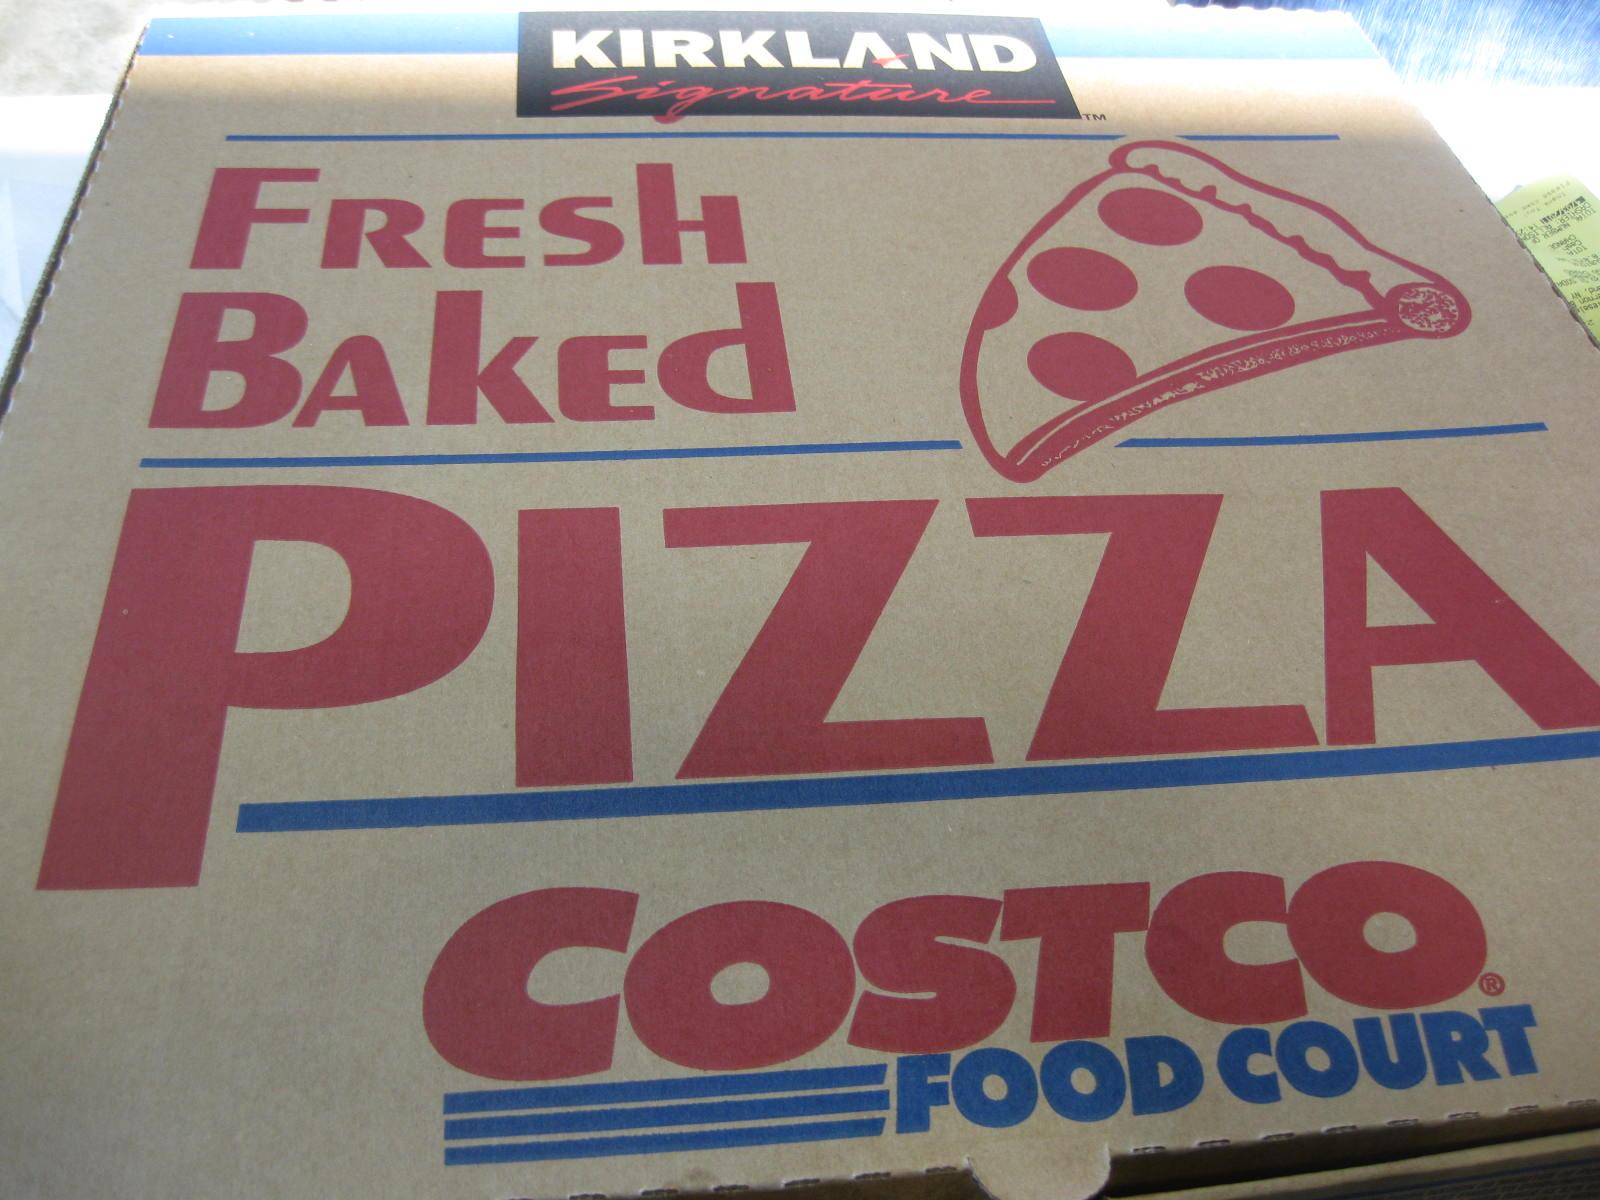 bleecker street pizza new york